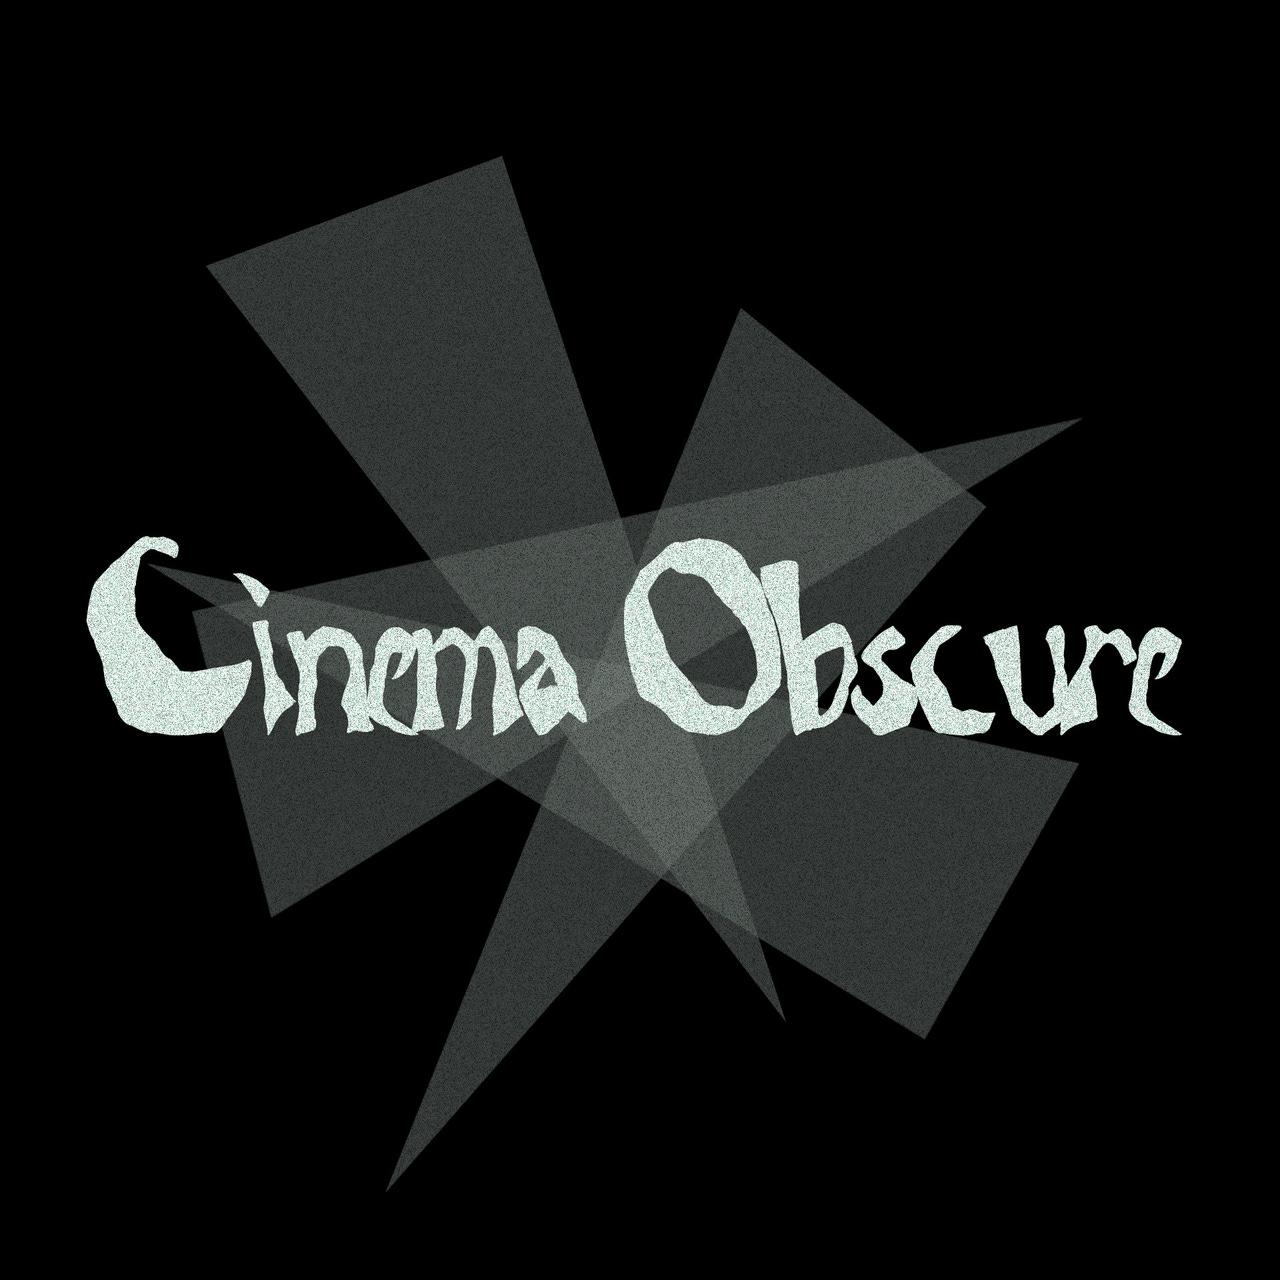 Cinema Obscure Newsletter